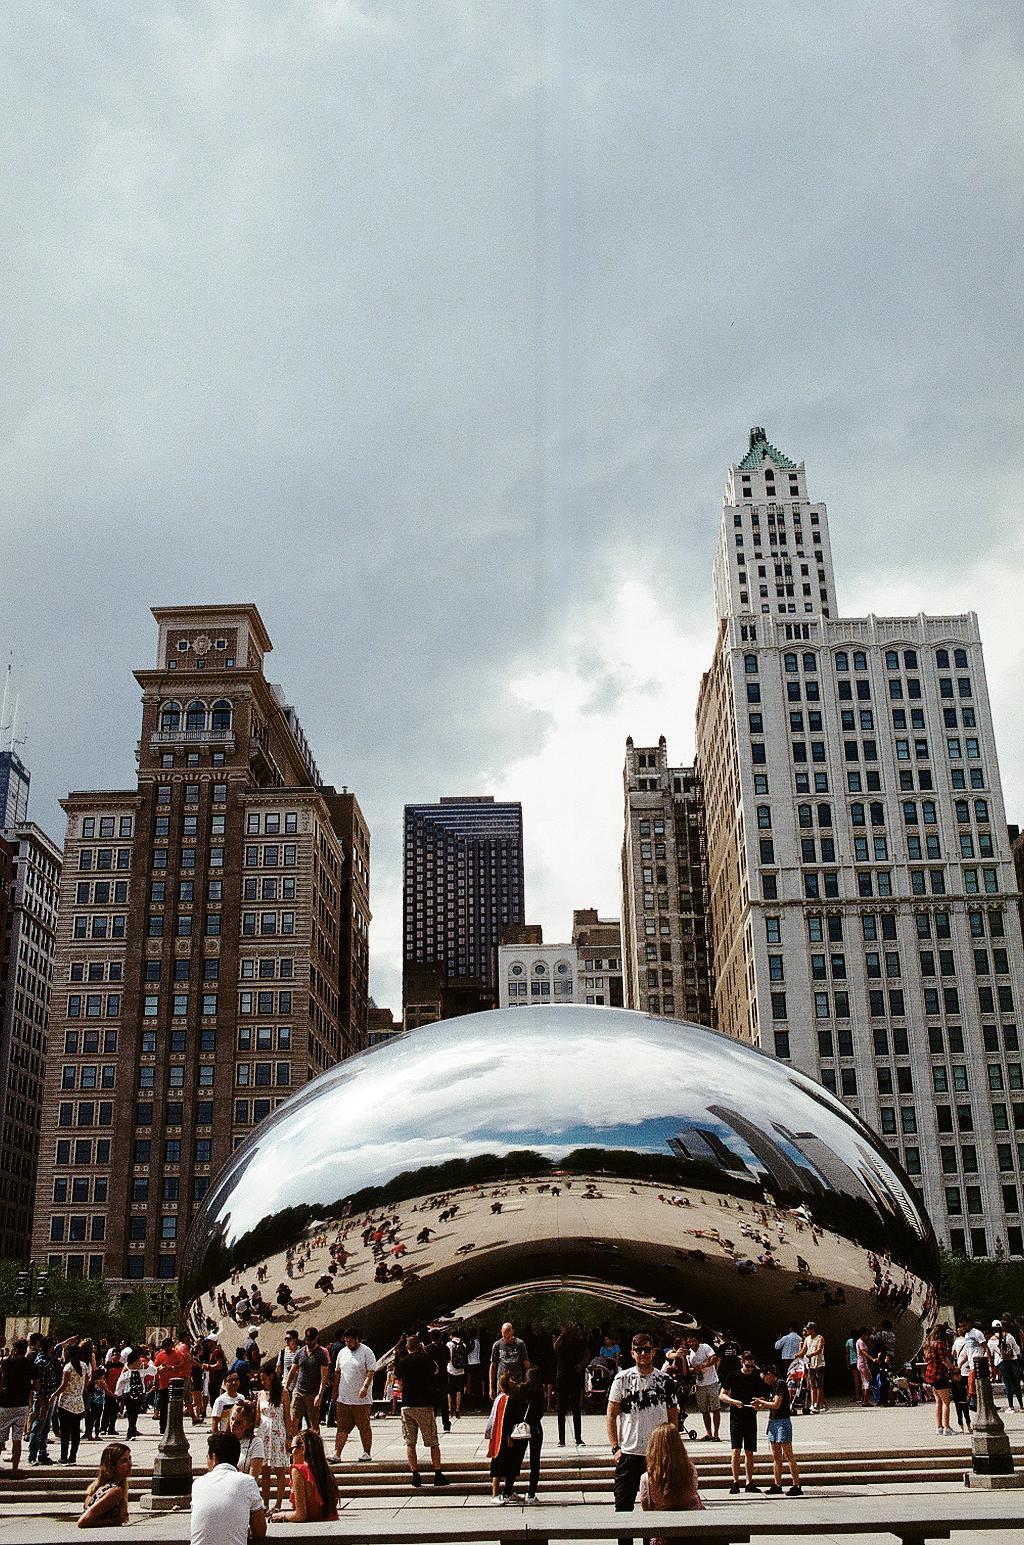 Chicago on Film  |  LITTLE HENRY LEE